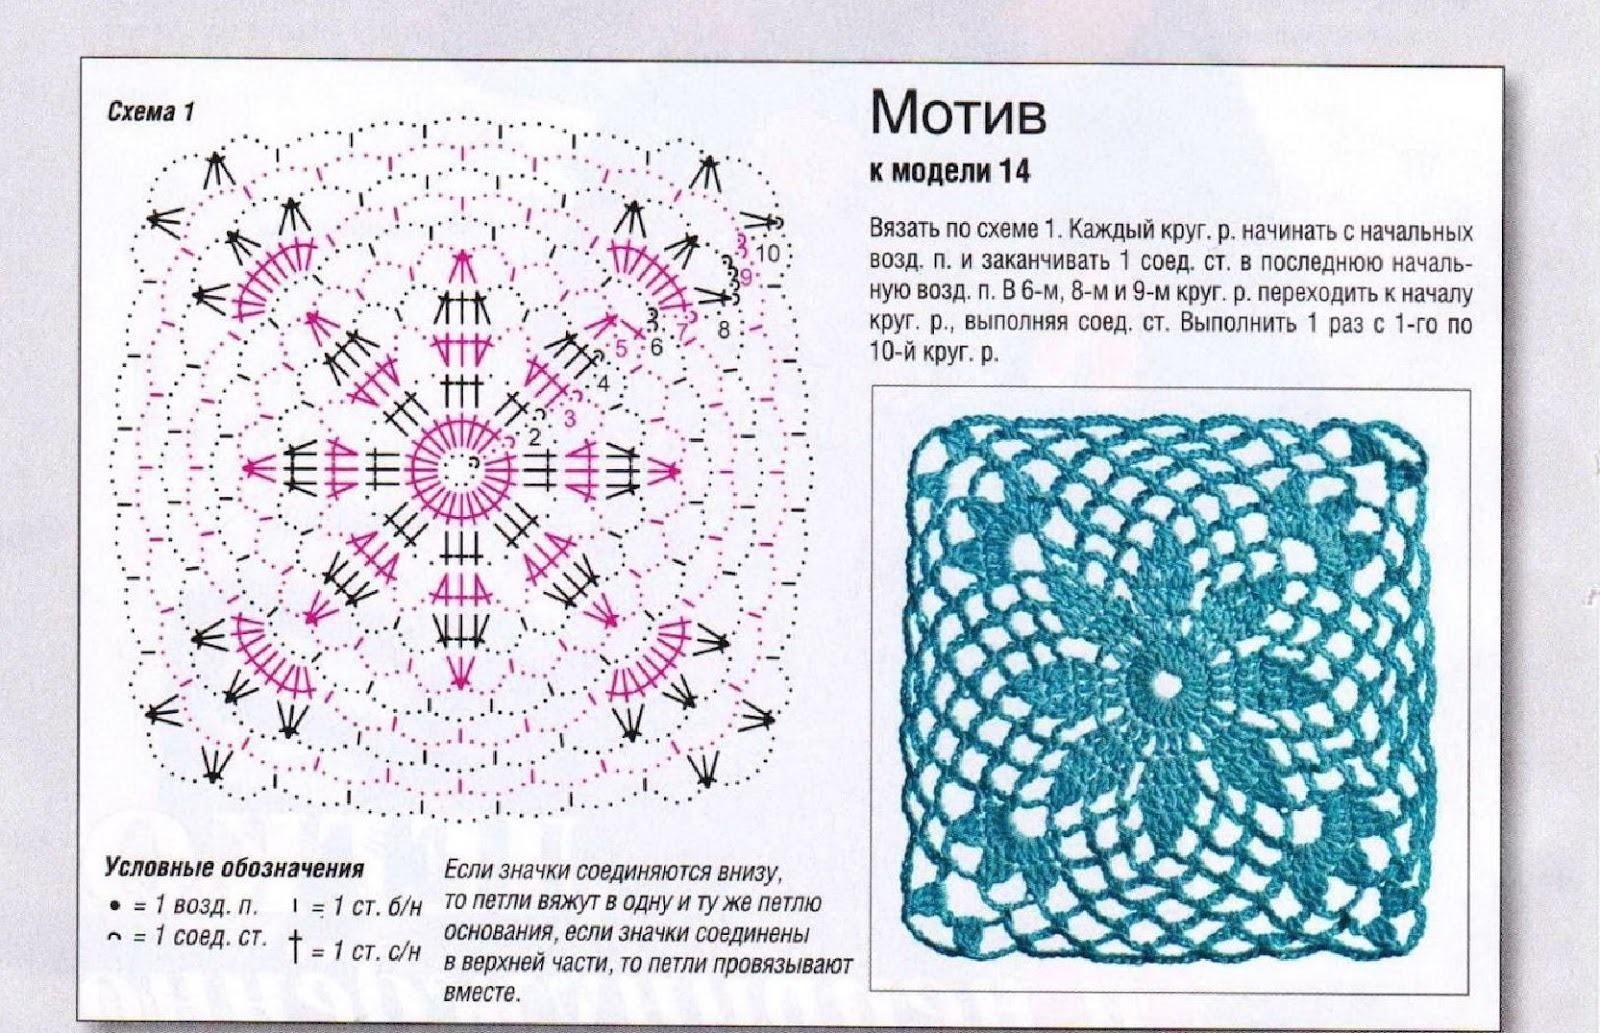 бельдиби мотив крючком схема и описание фото гугл фото